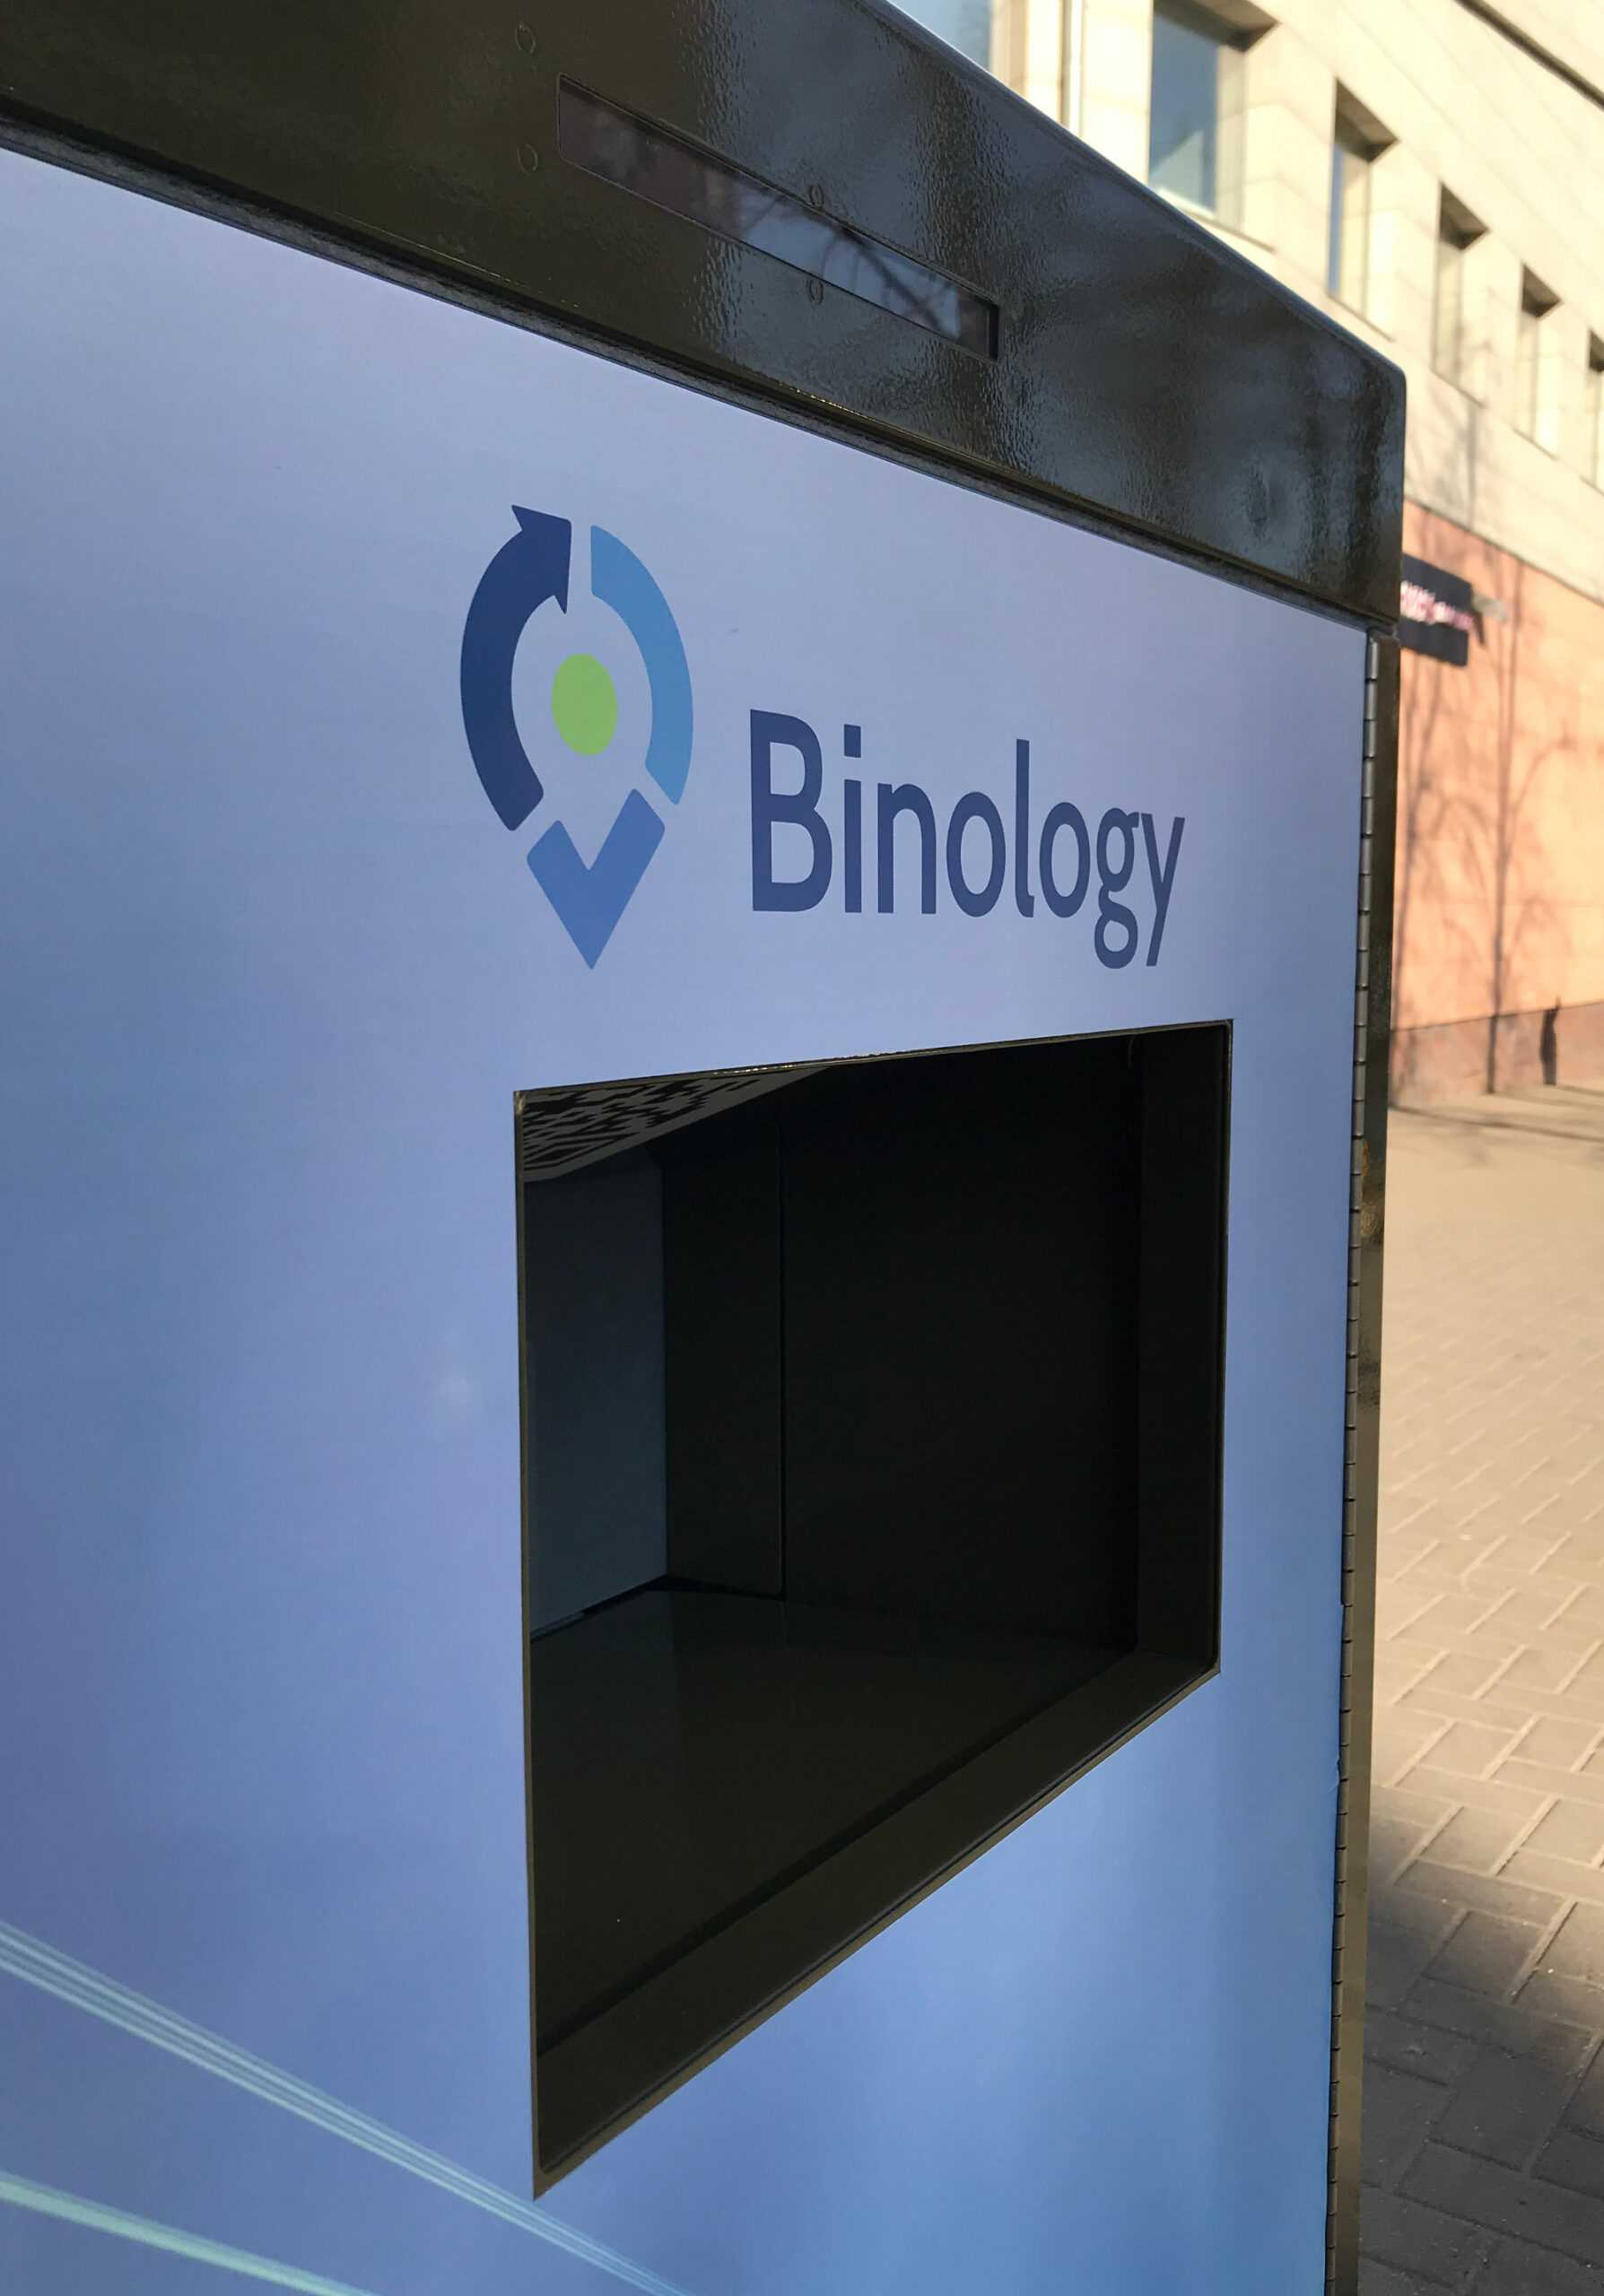 Binology SmartCity Bin 120 - Photo 4